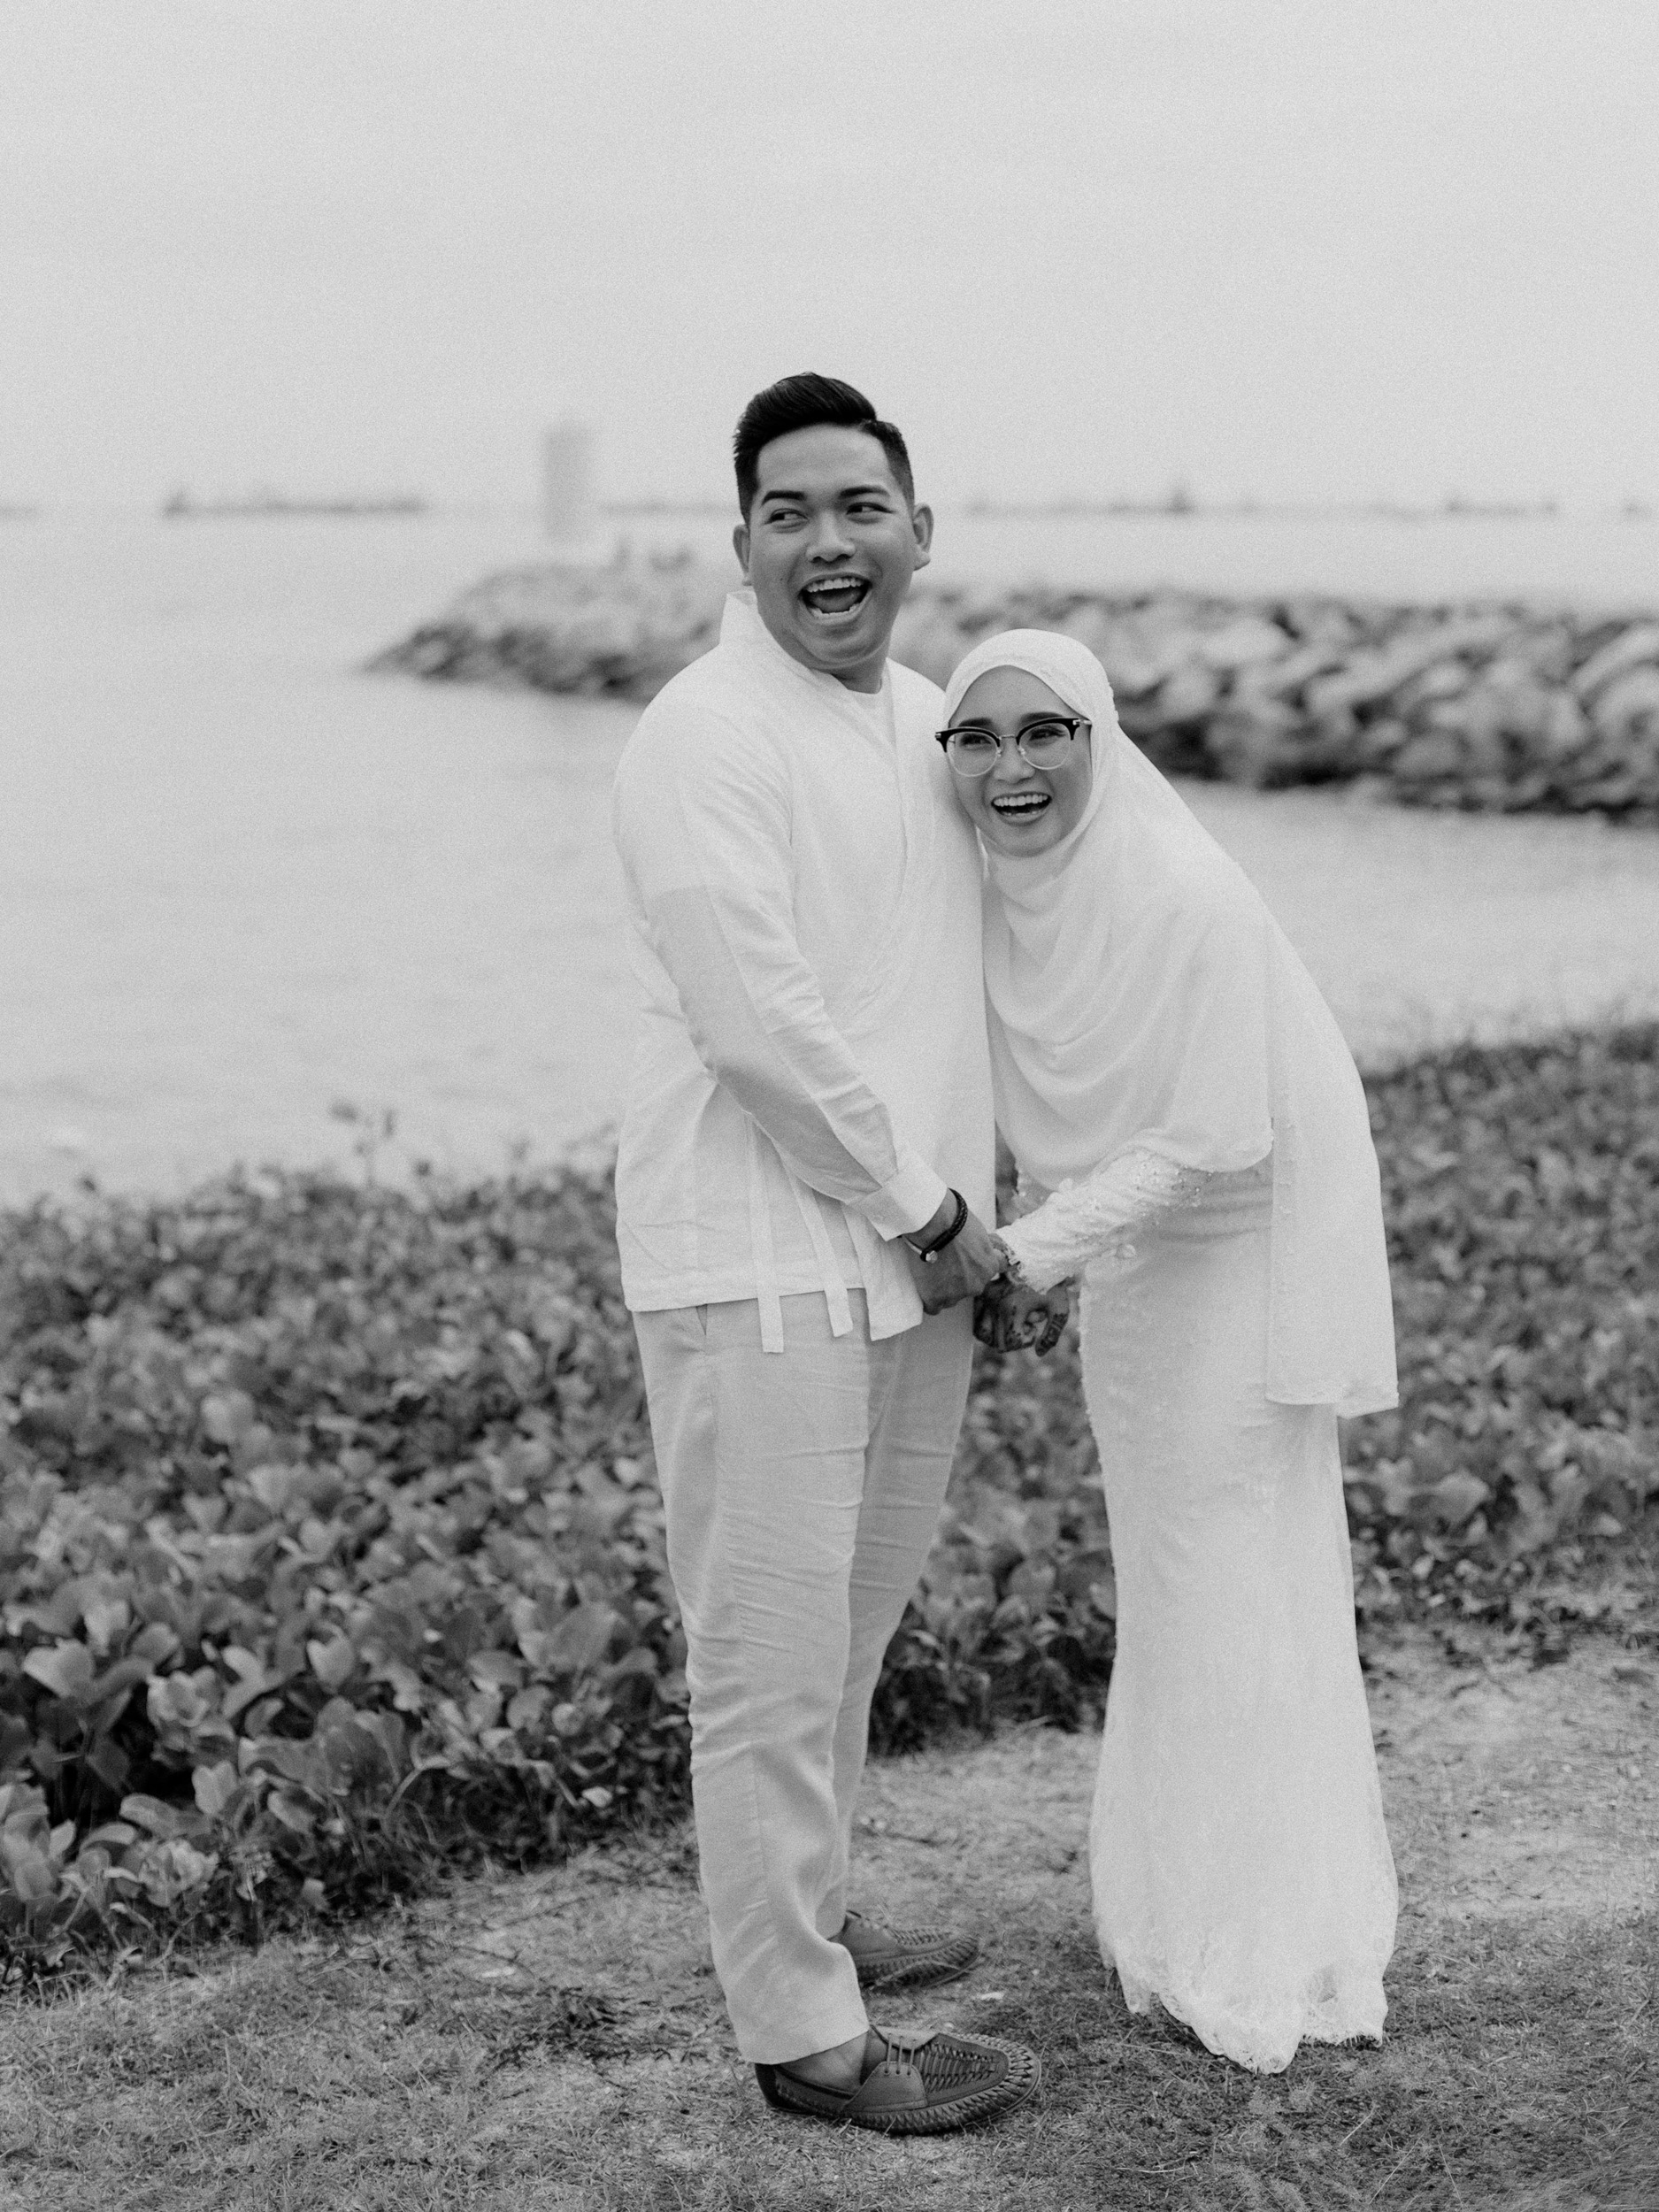 singapore-wedding-photographer-photography-wmt2017-148.jpg